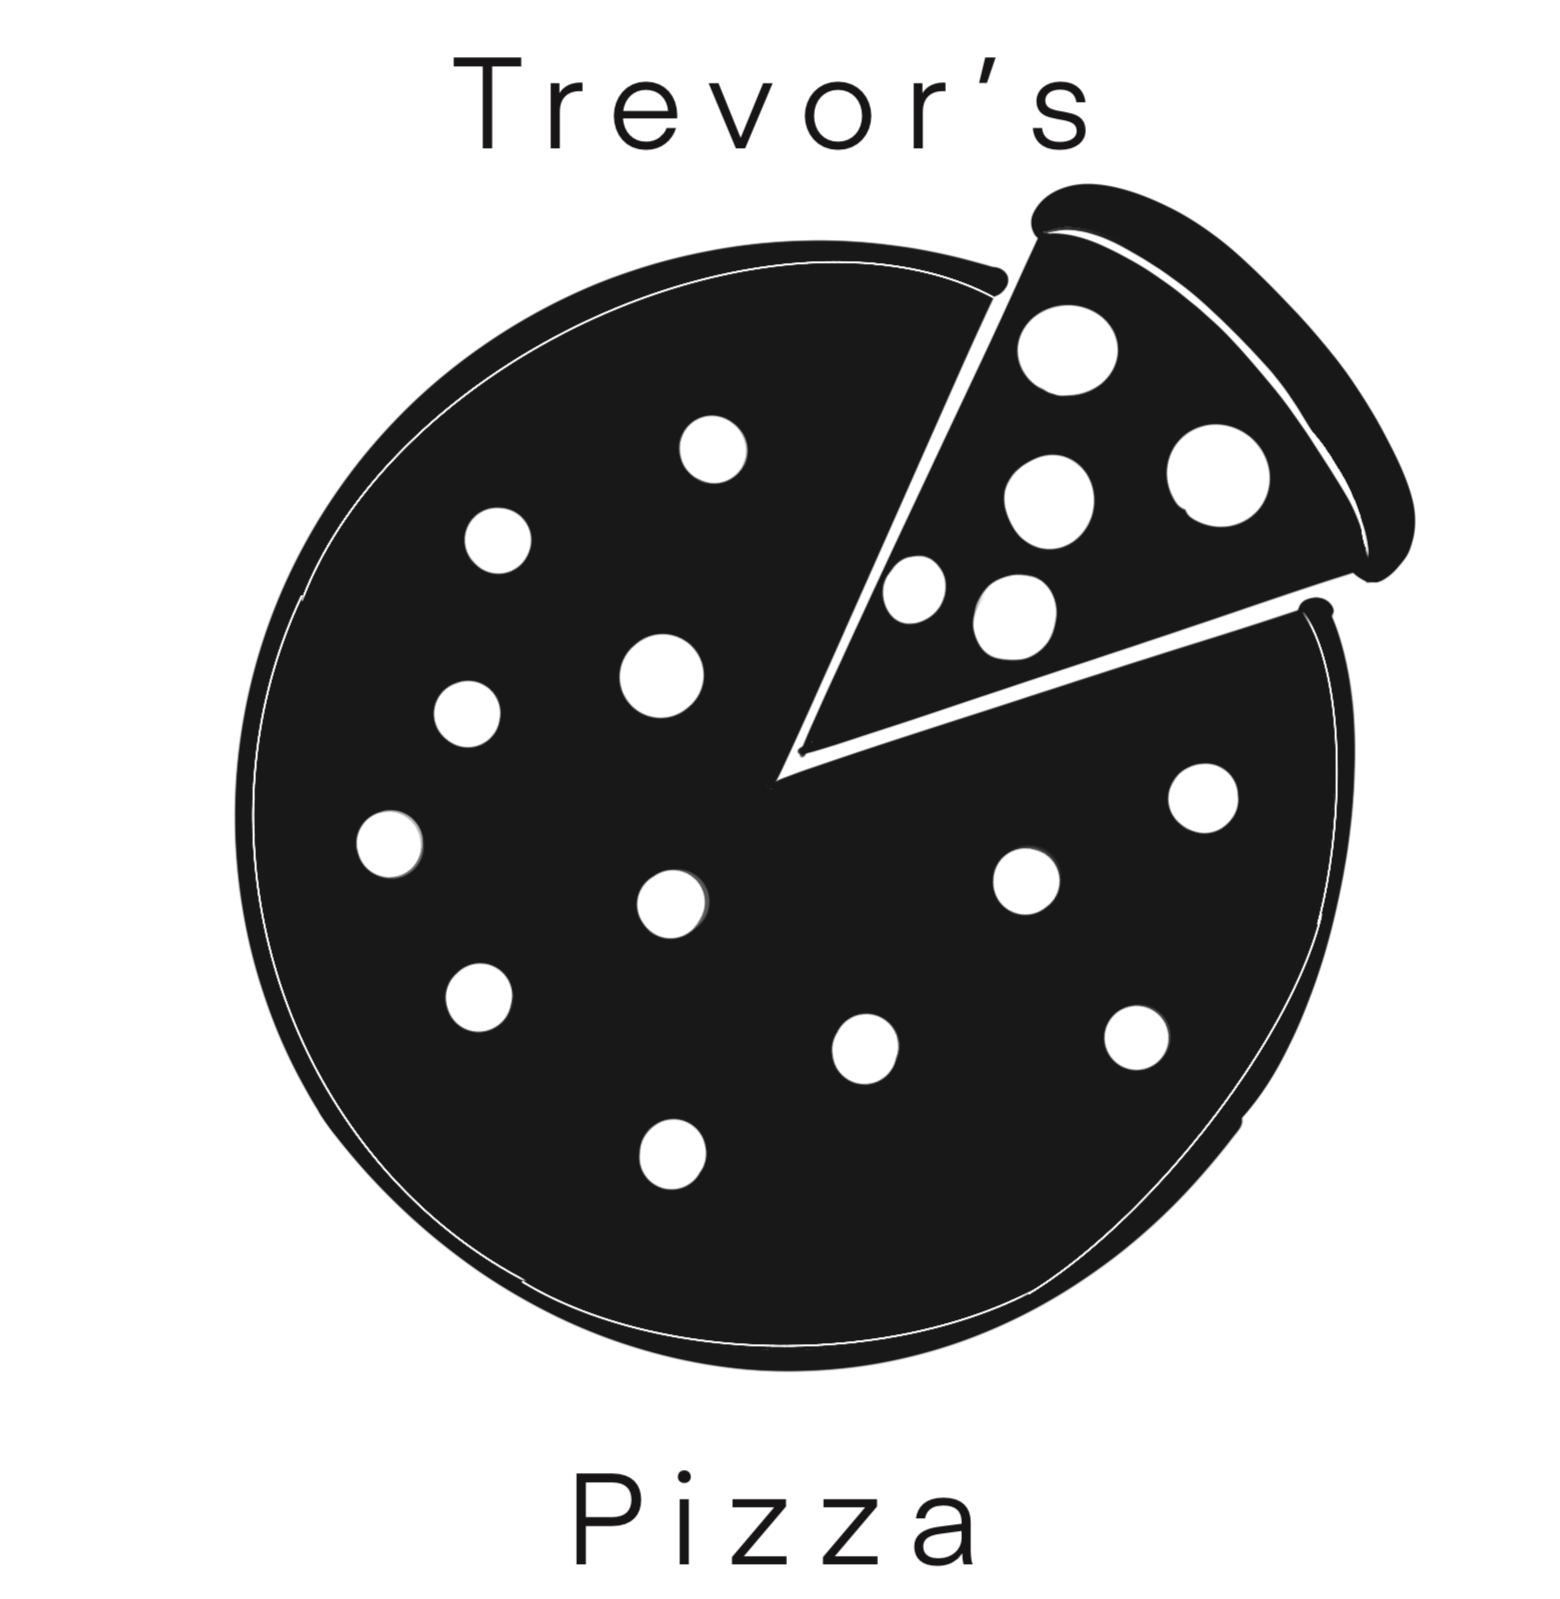 Trevor's%20Pizza%20Logo%20Complete_edite